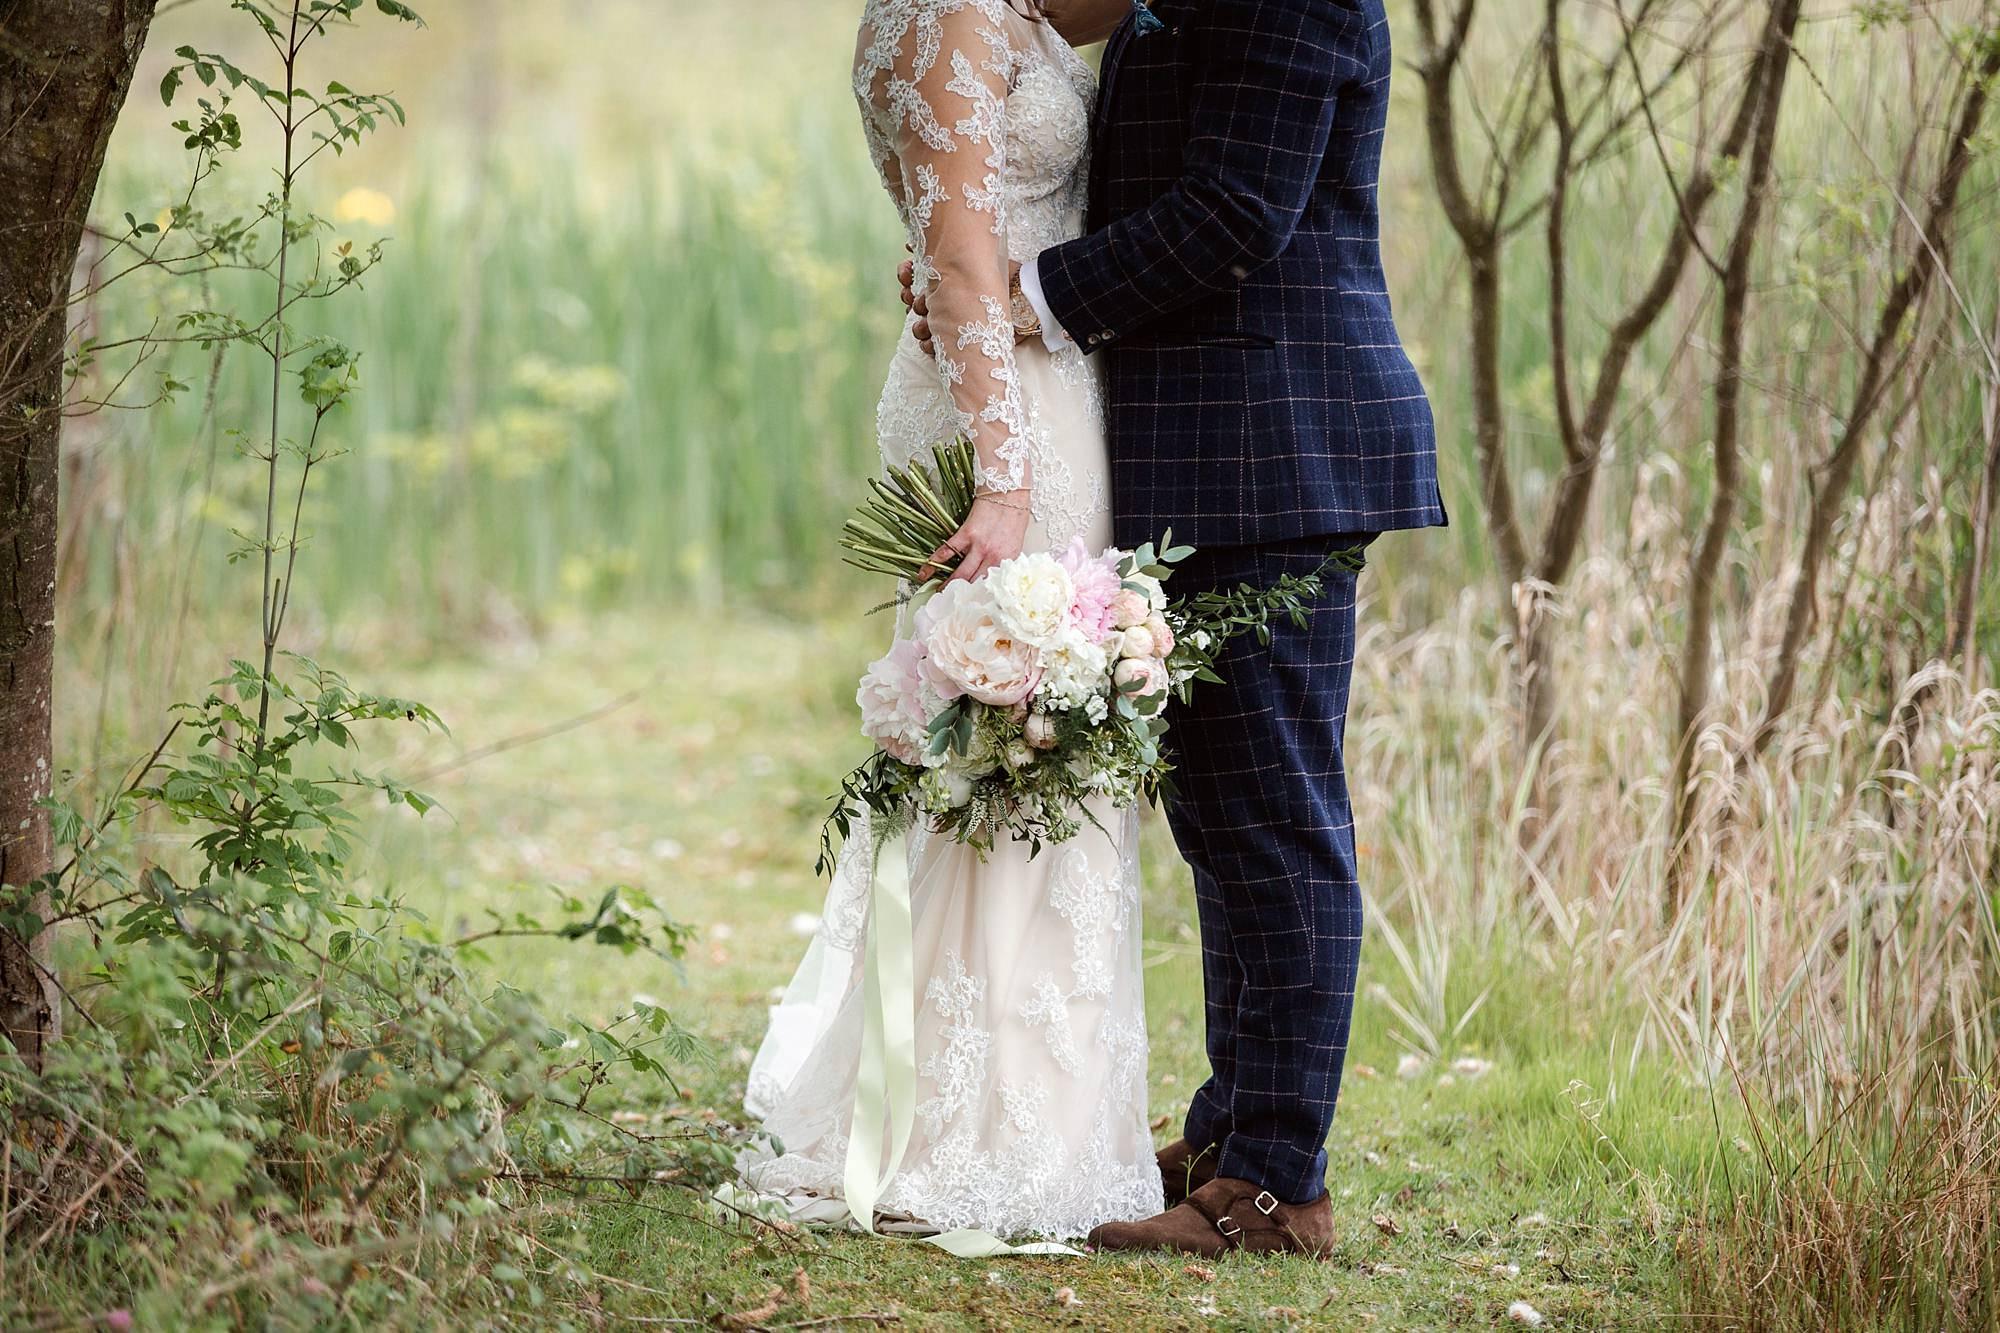 humanist wedding old greens barn bride and groom's legs